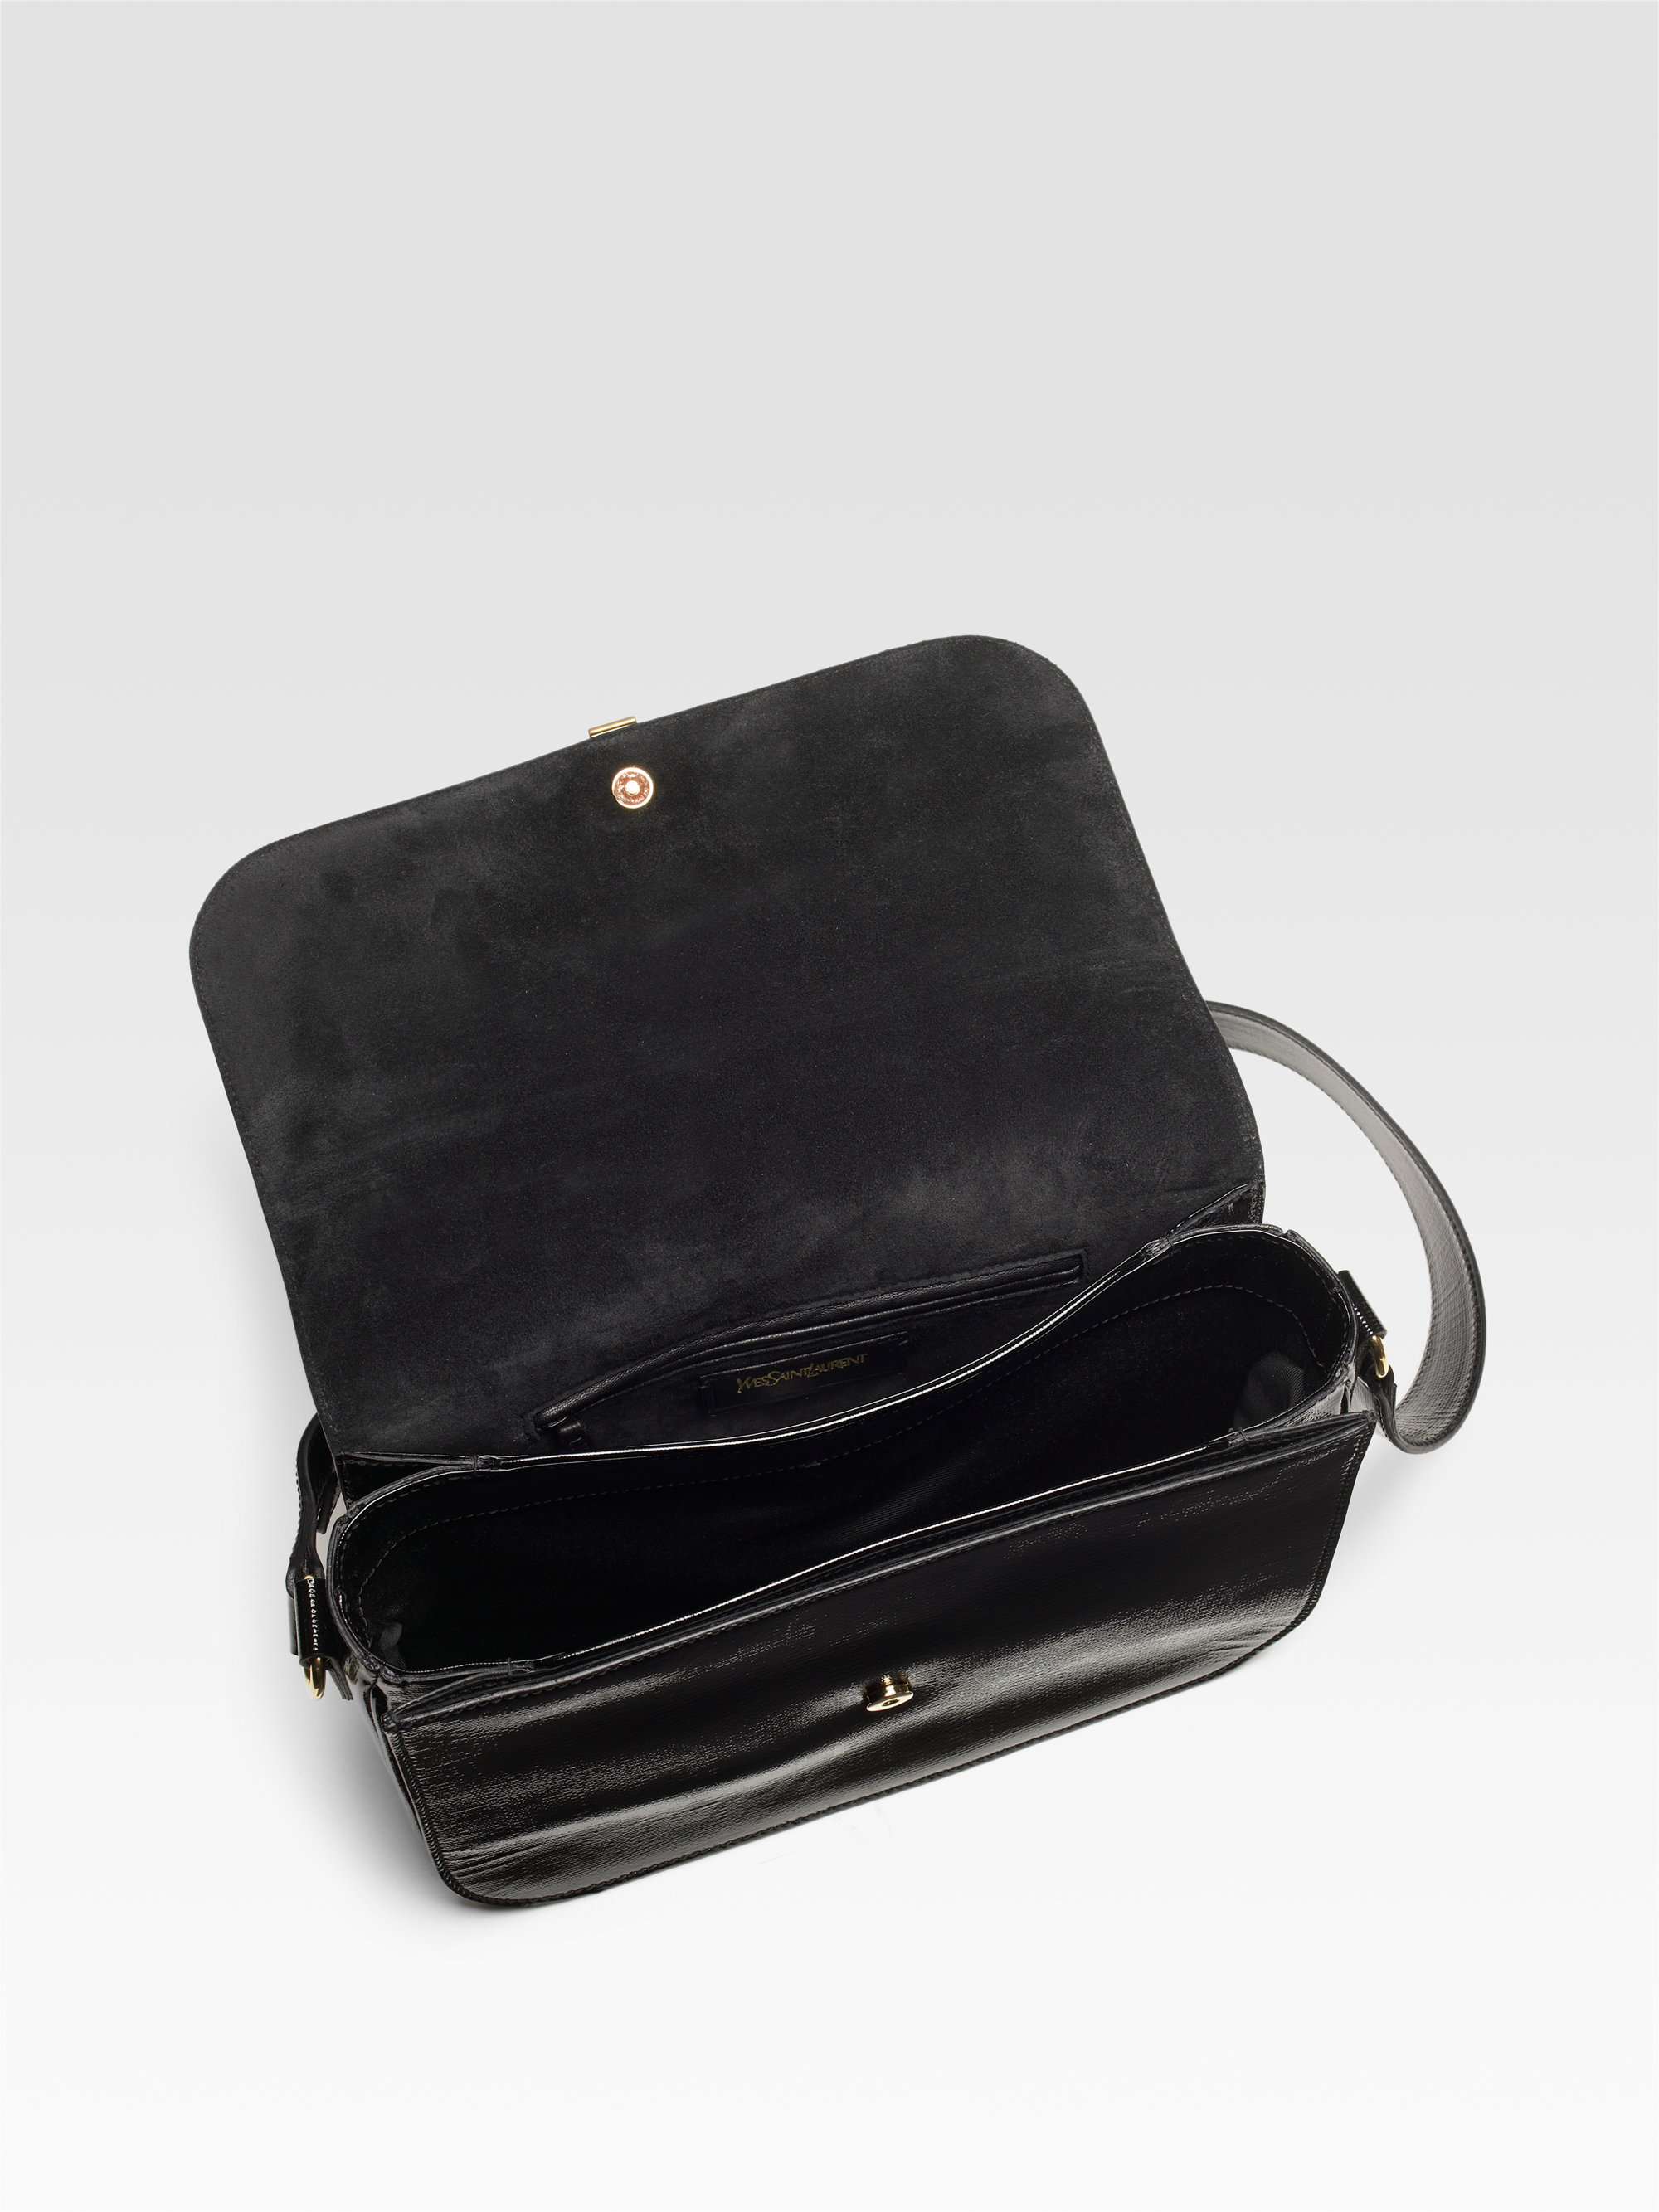 ysl chyc flap bag